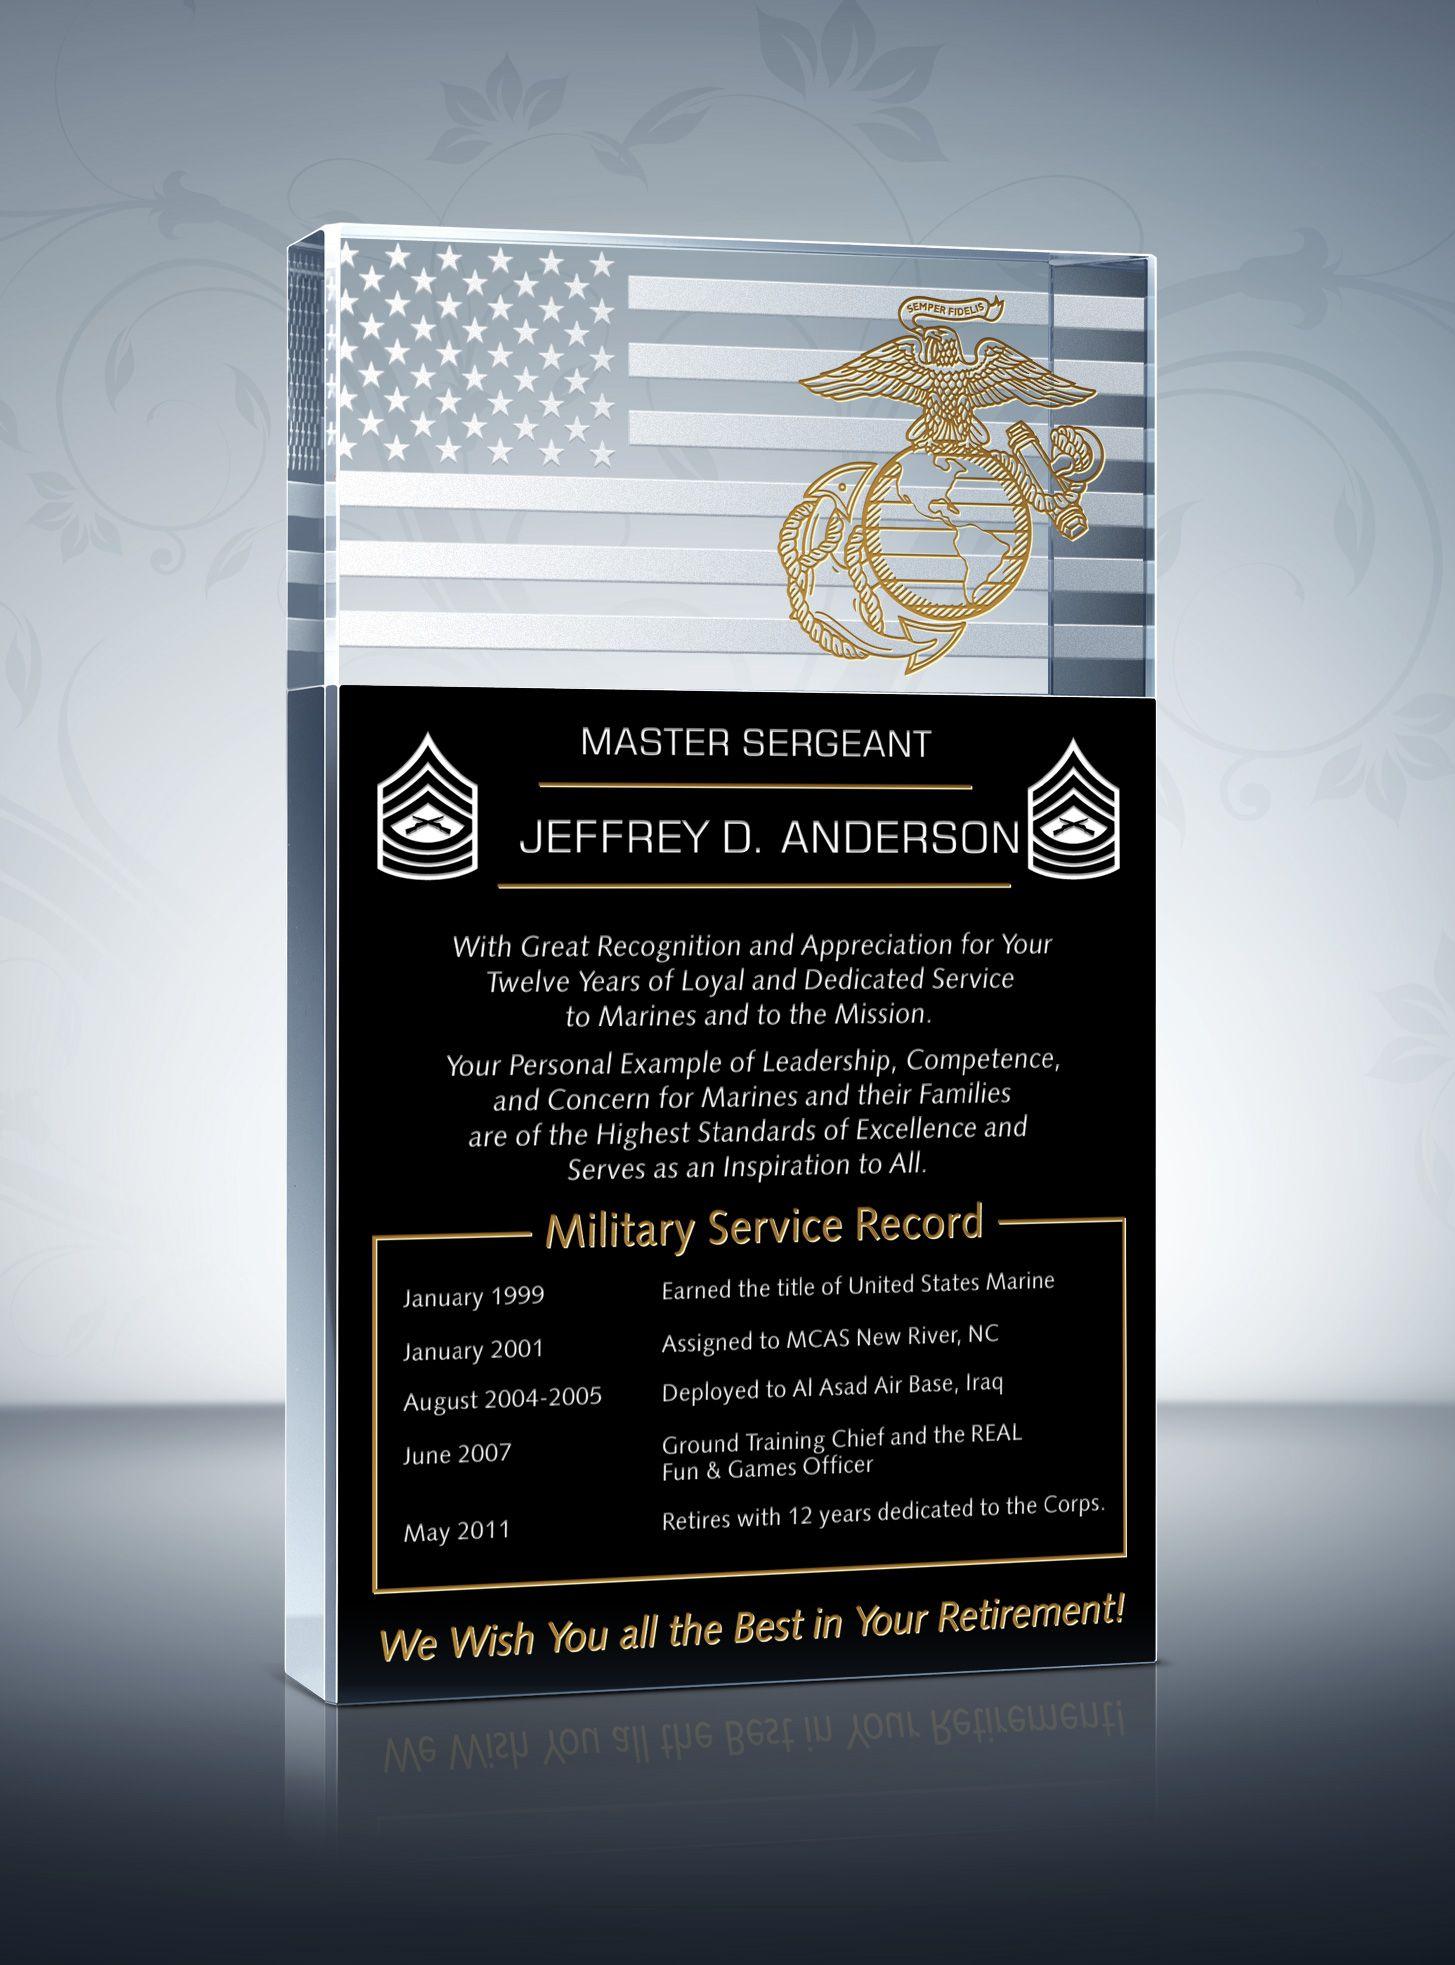 Marine Corps Retirement Plaque and Poem Samples | Retirement ...